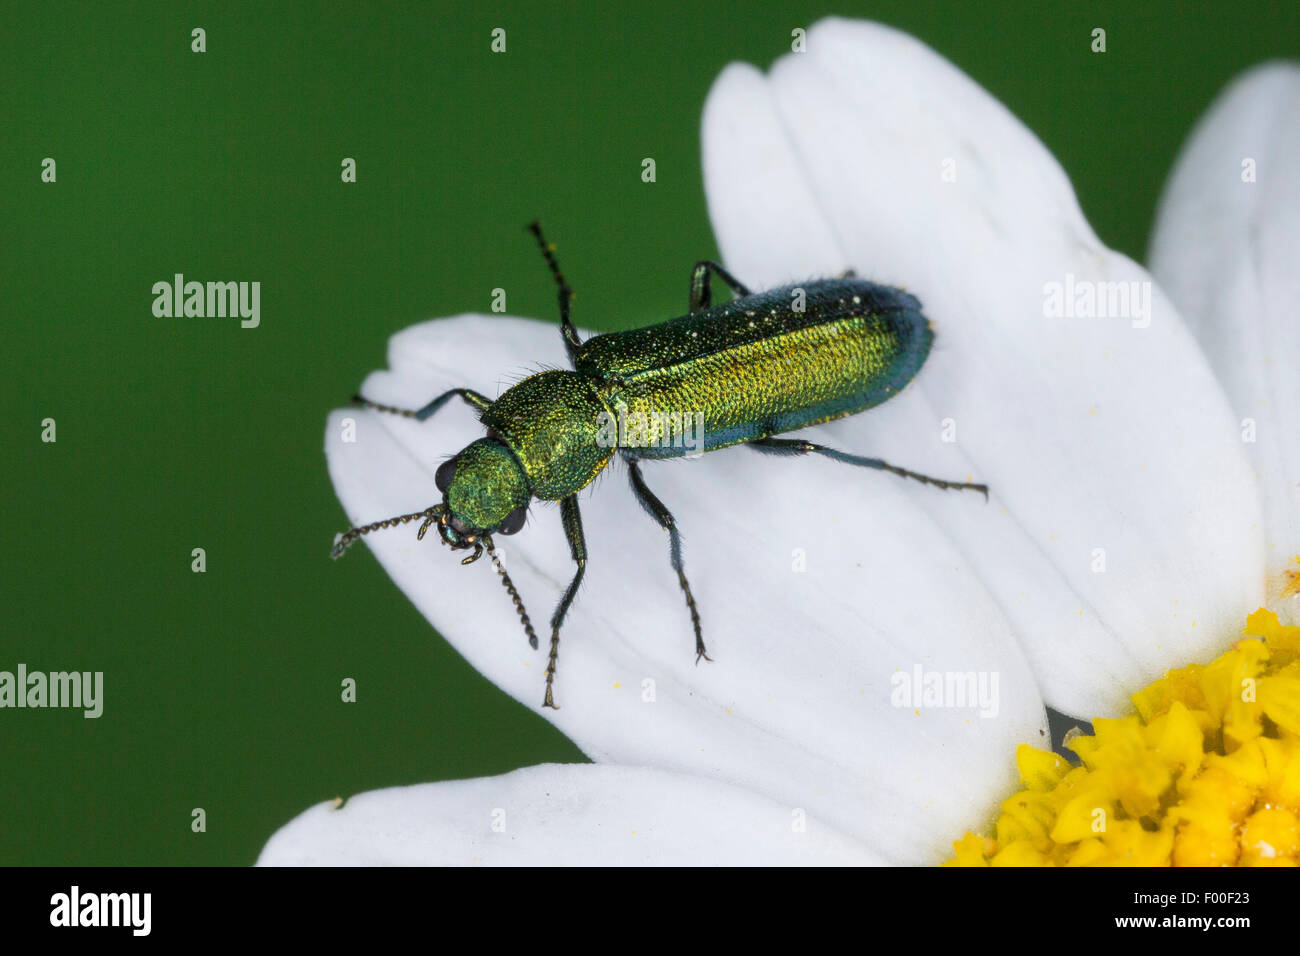 Soft-winged flower beetle (Psilothrix viridicoeruleus, Psilothrix viridicoerulea), su un fiore bianco, Germania Immagini Stock